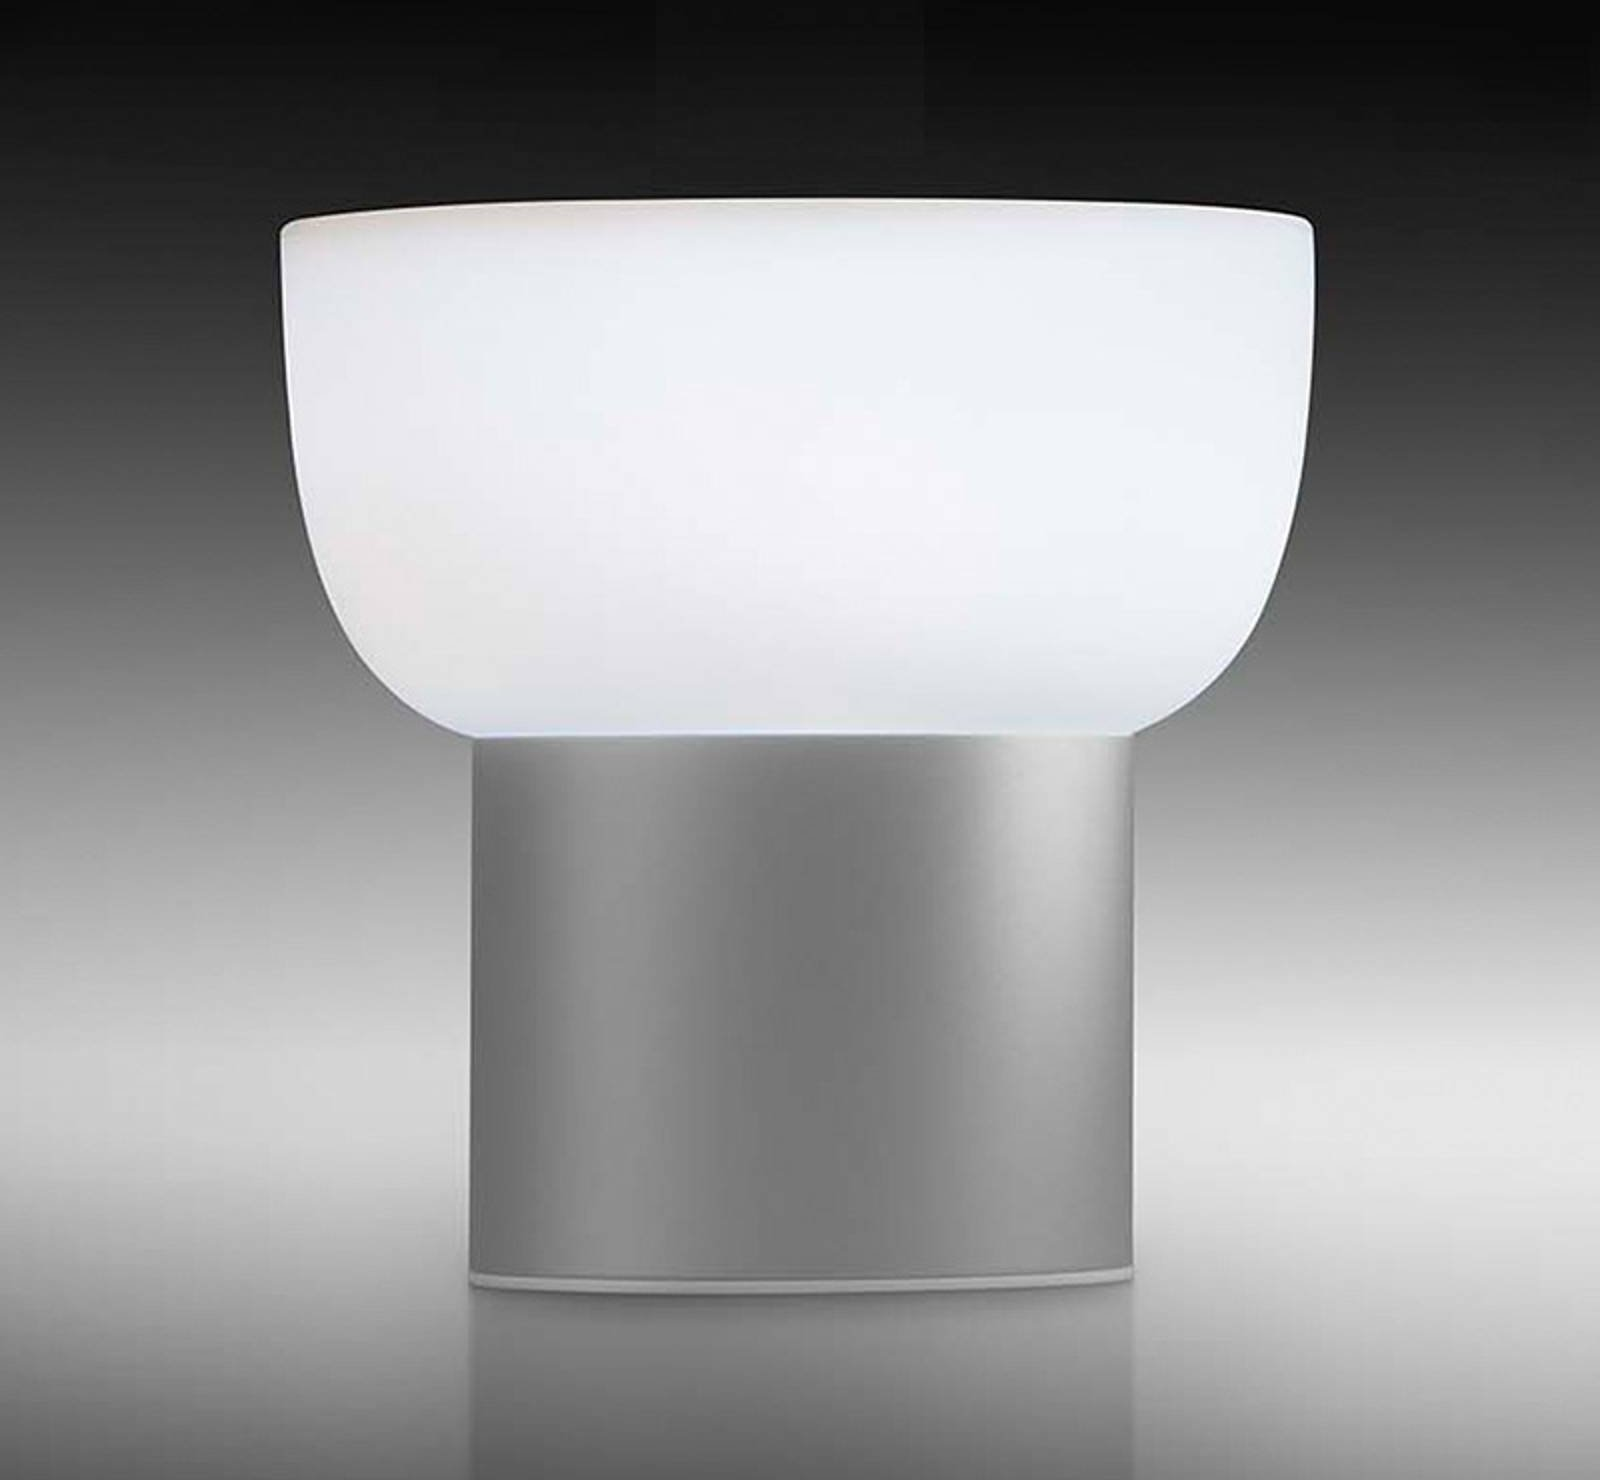 Patio LED decorative outdoor light  silver  16 cm